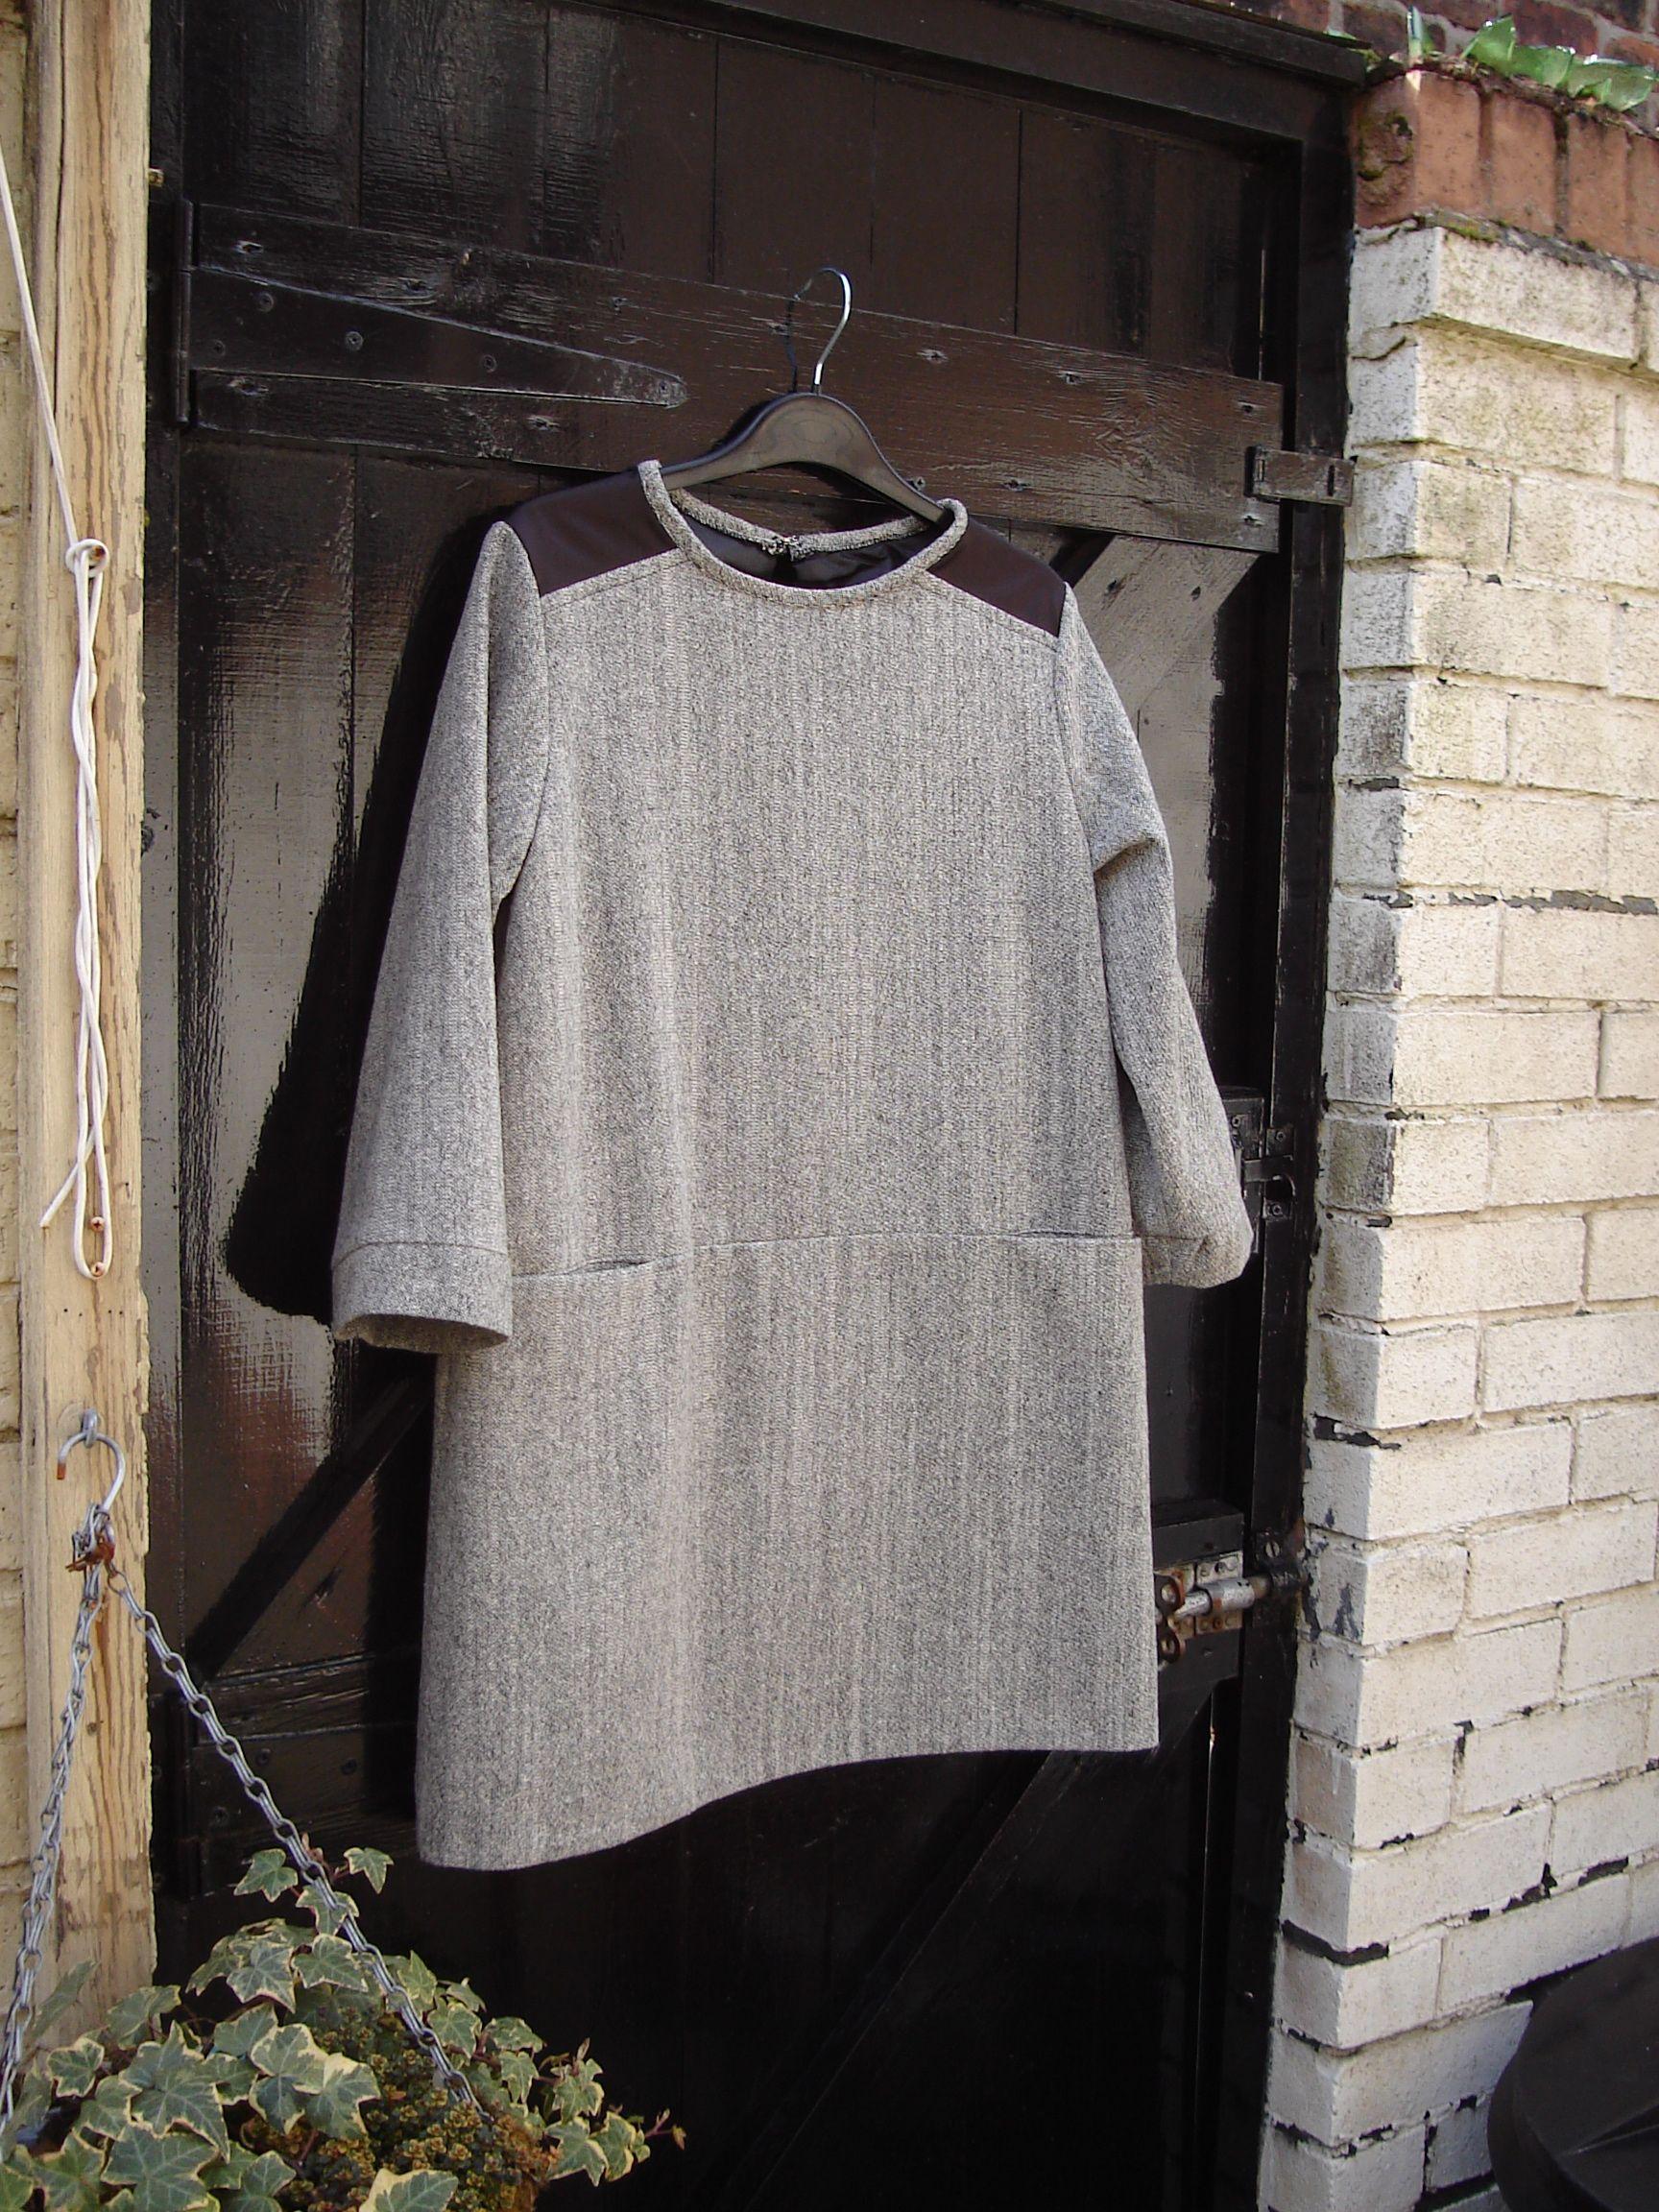 Customer order, wool shift dress, 3/4 length sleeve, fully lined, lapel detail